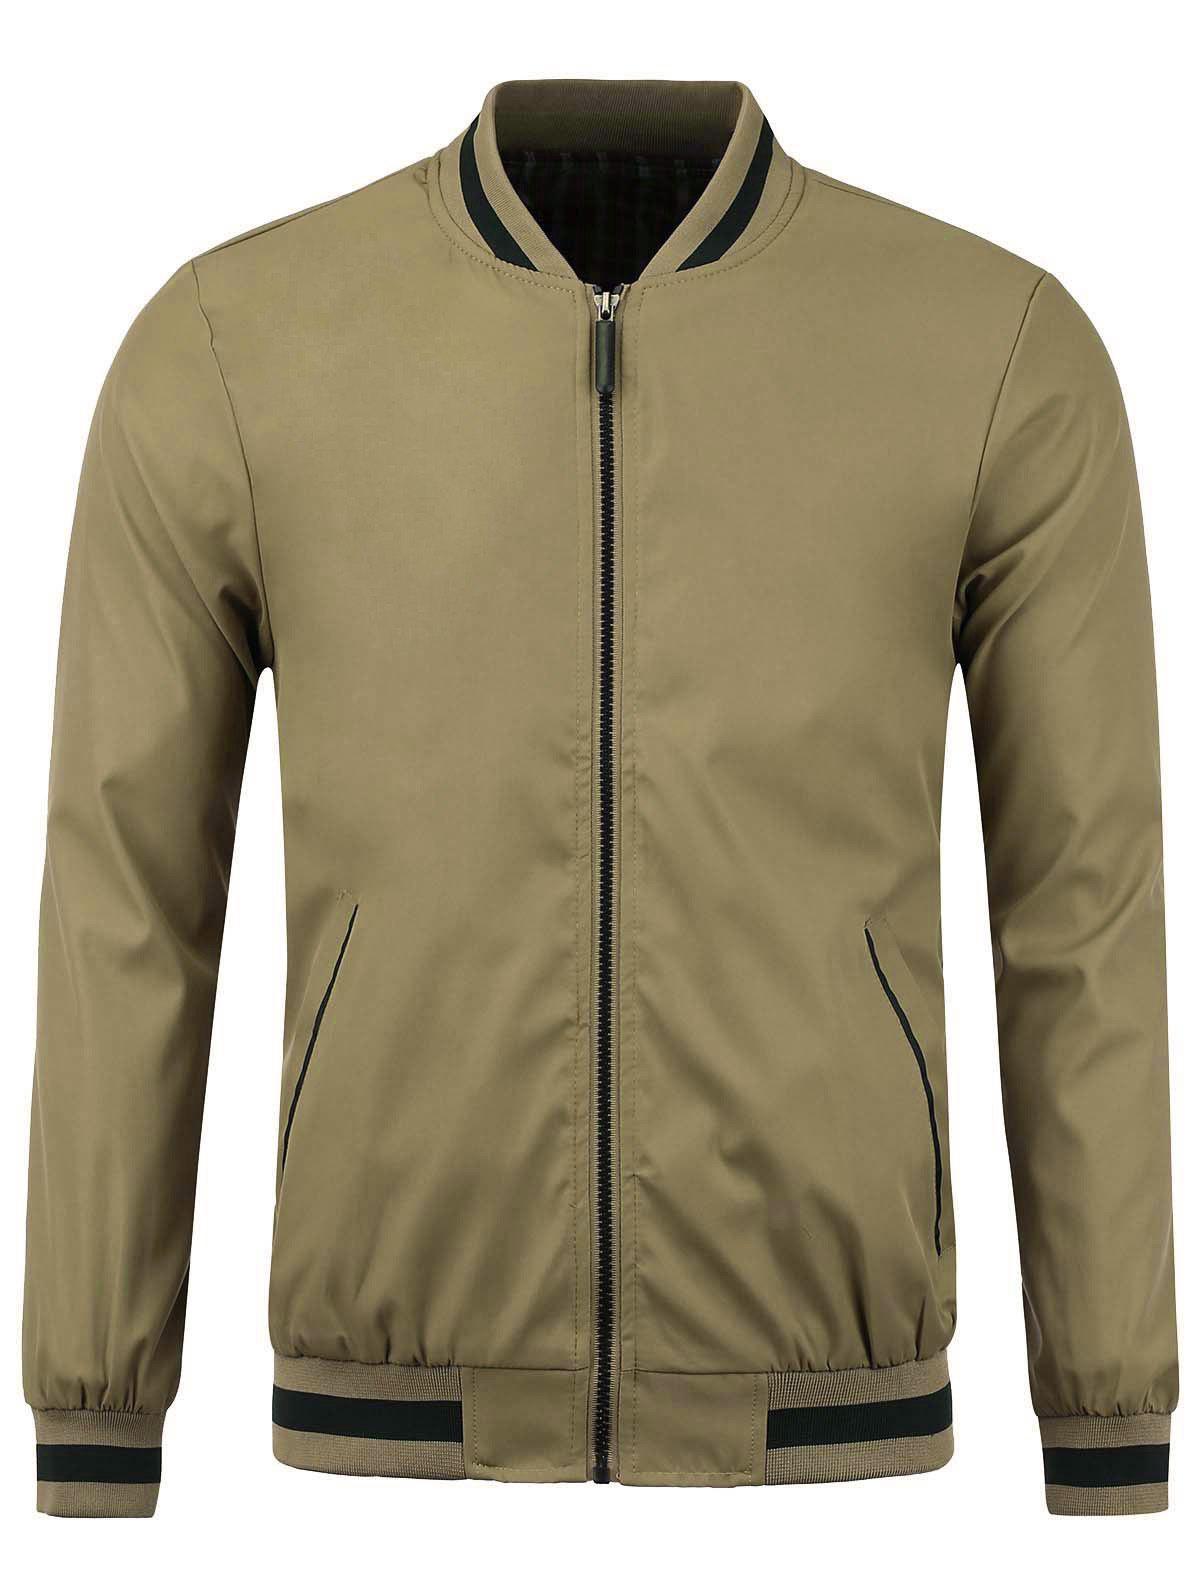 Stripe Rib Panel Stand Collar Zip Up Jacket 220081317